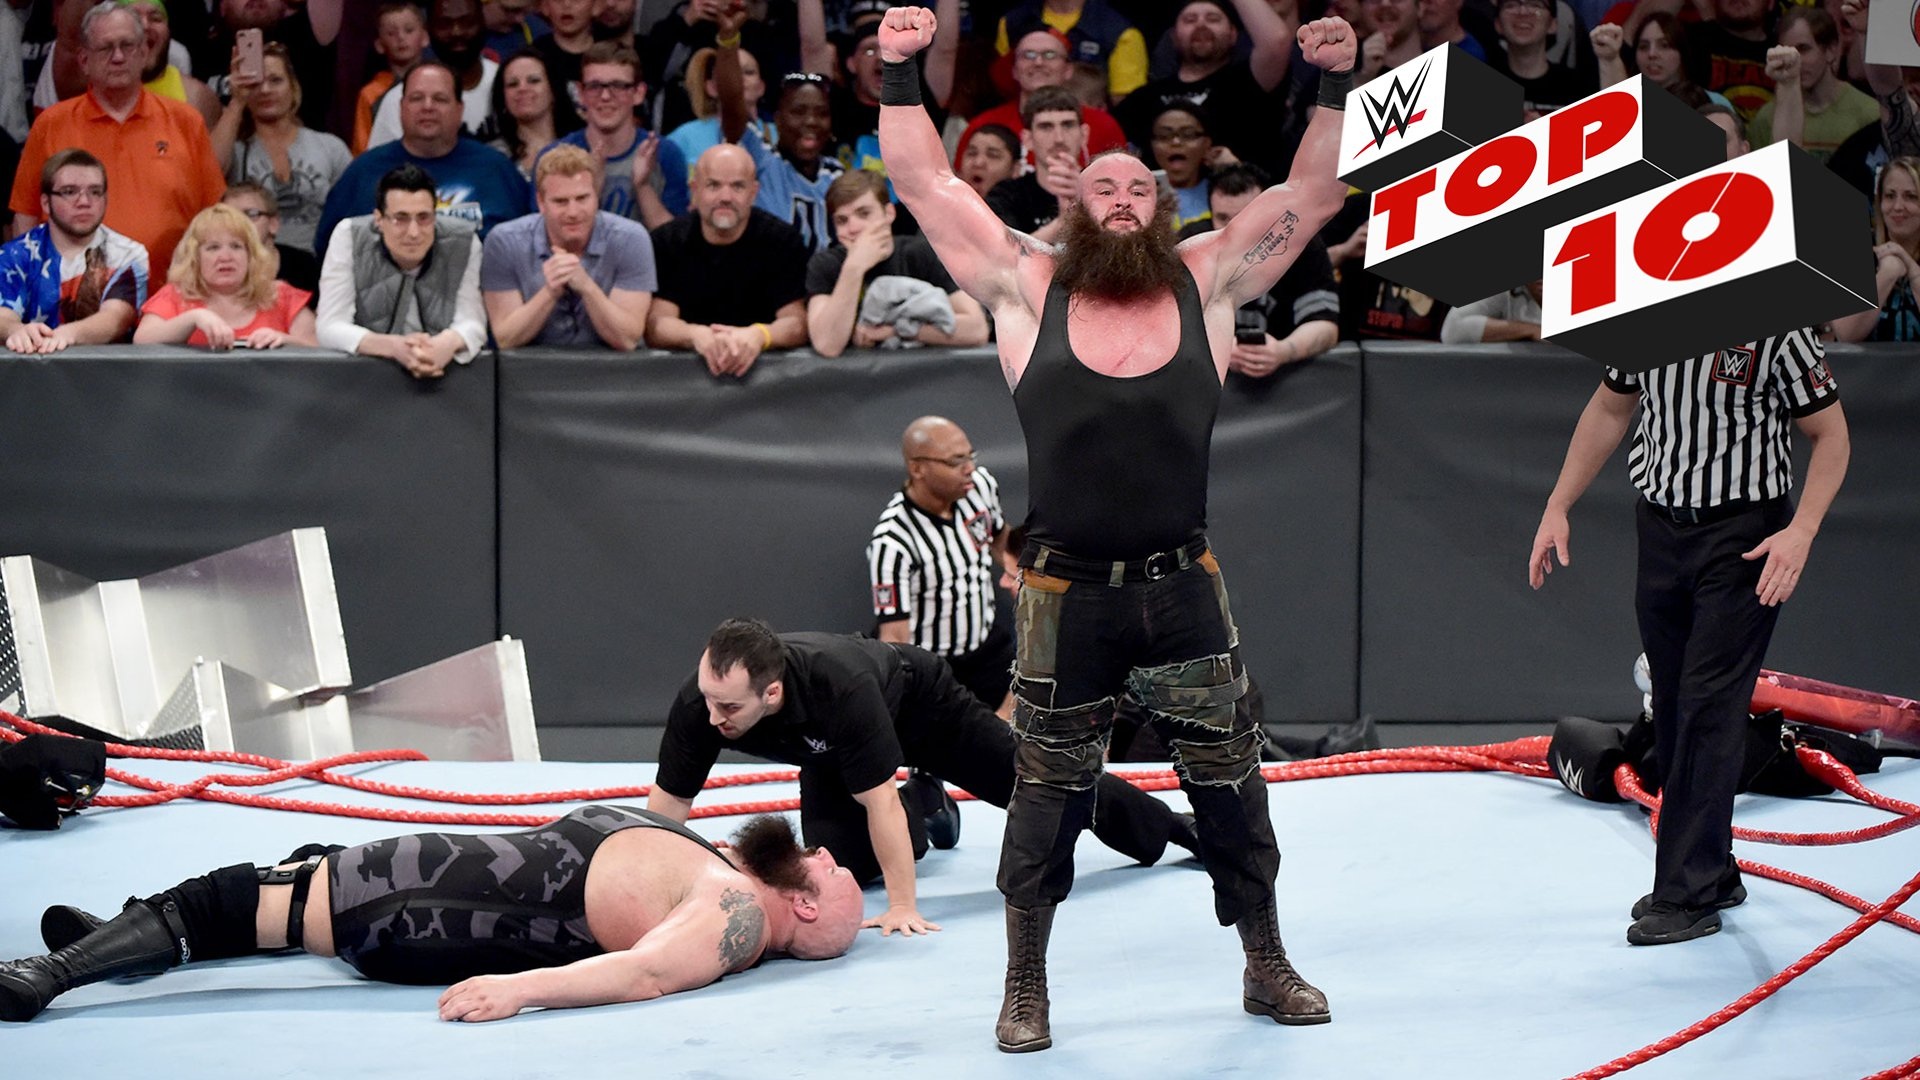 Top 10 momentów Raw: WWE Top 10 17.04.17